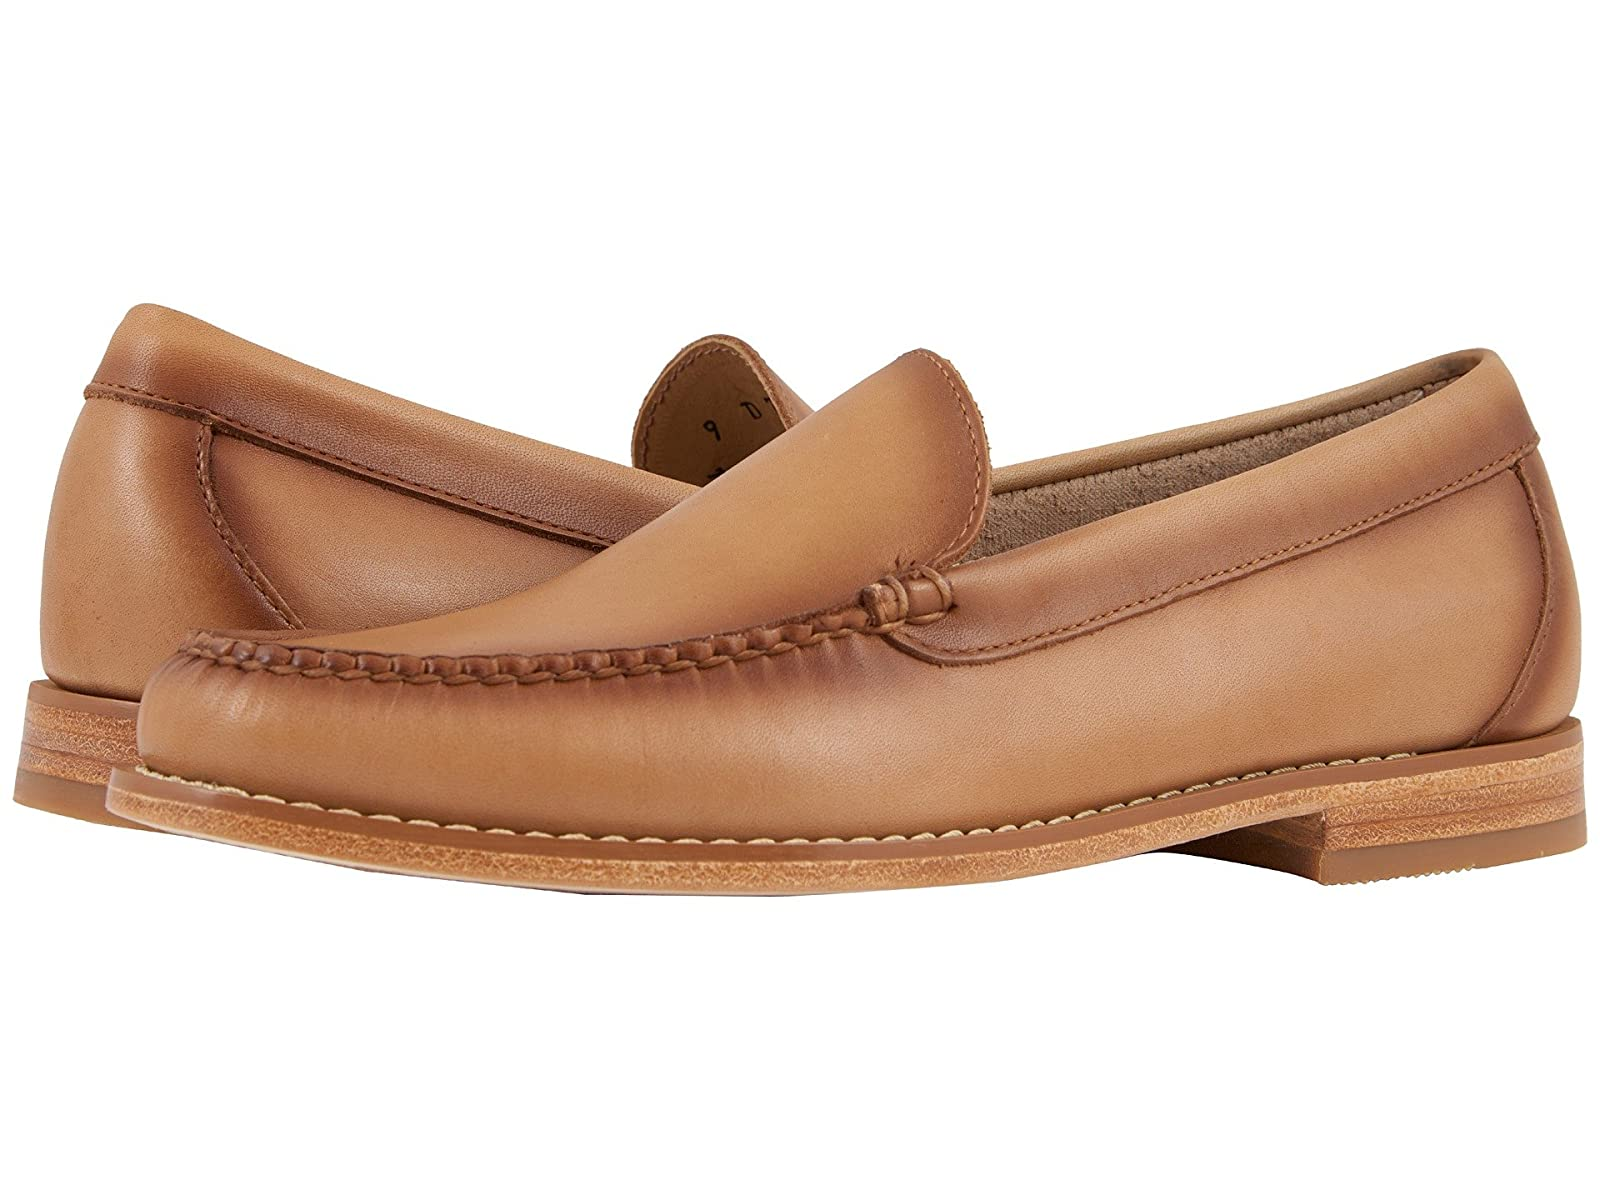 G.H. Bass & Co. Lance WeejunsAtmospheric grades have affordable shoes